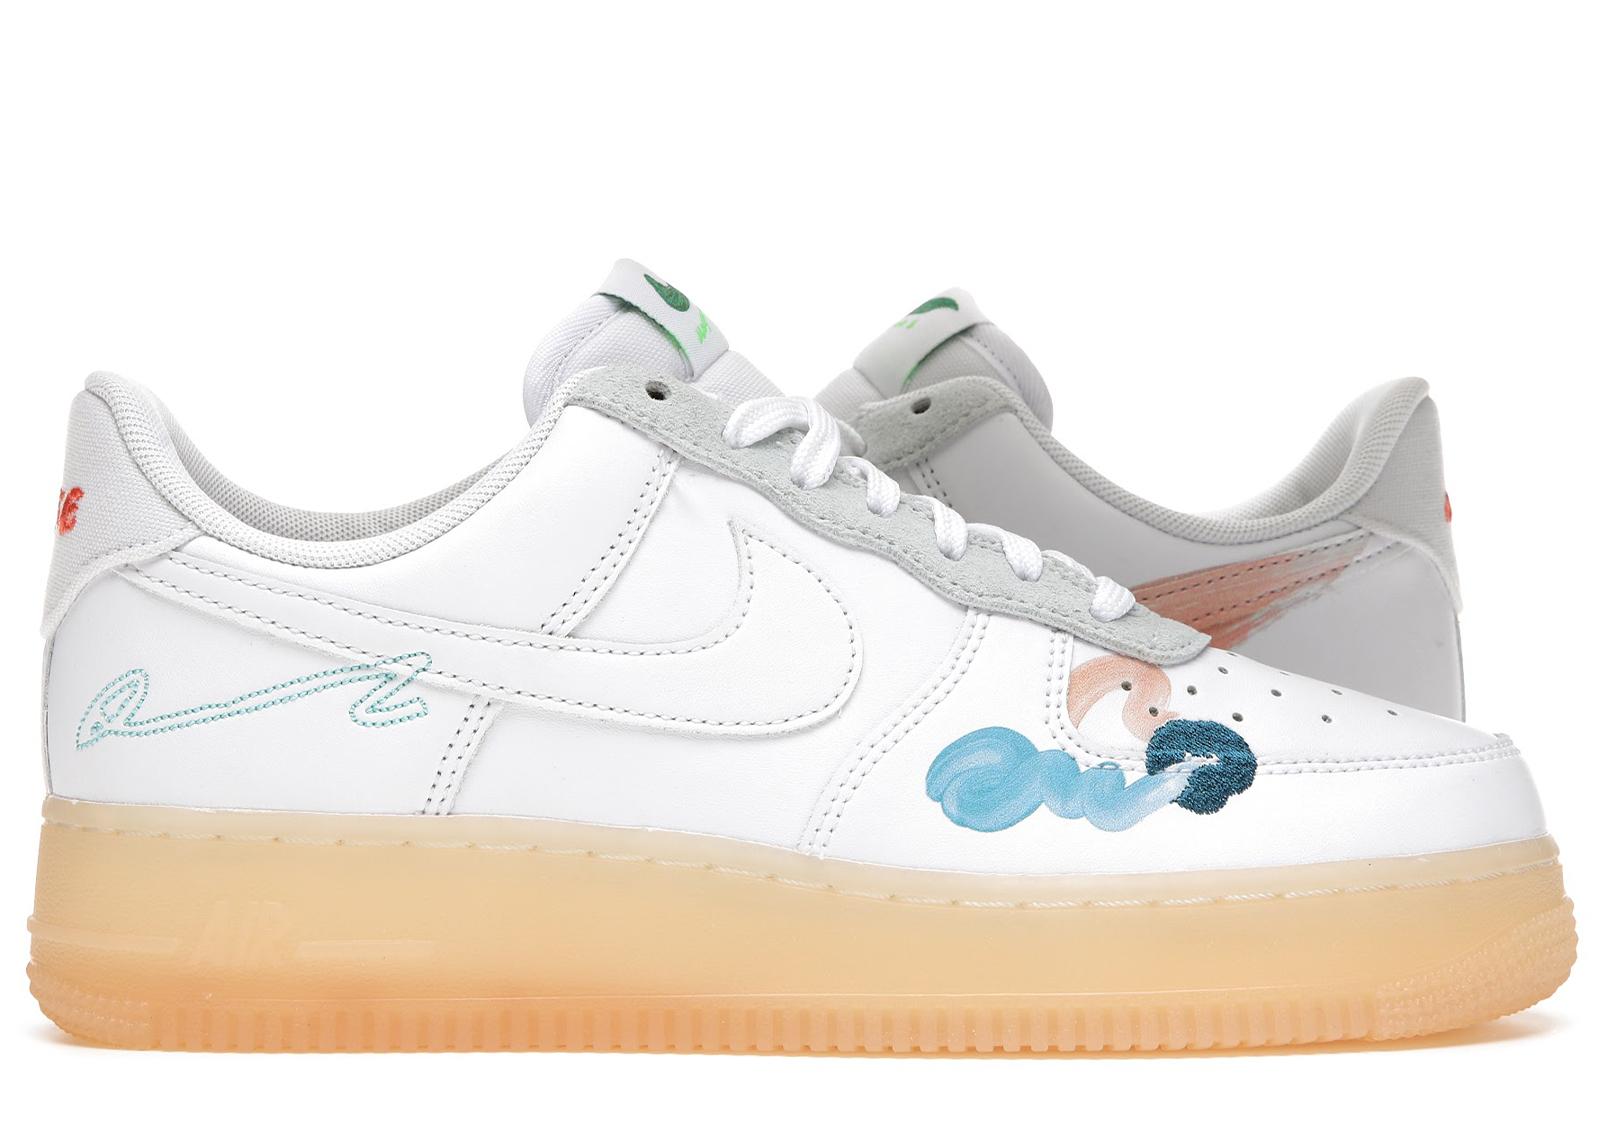 Nike Air Force 1 Flyleather Mayumi Yamase White